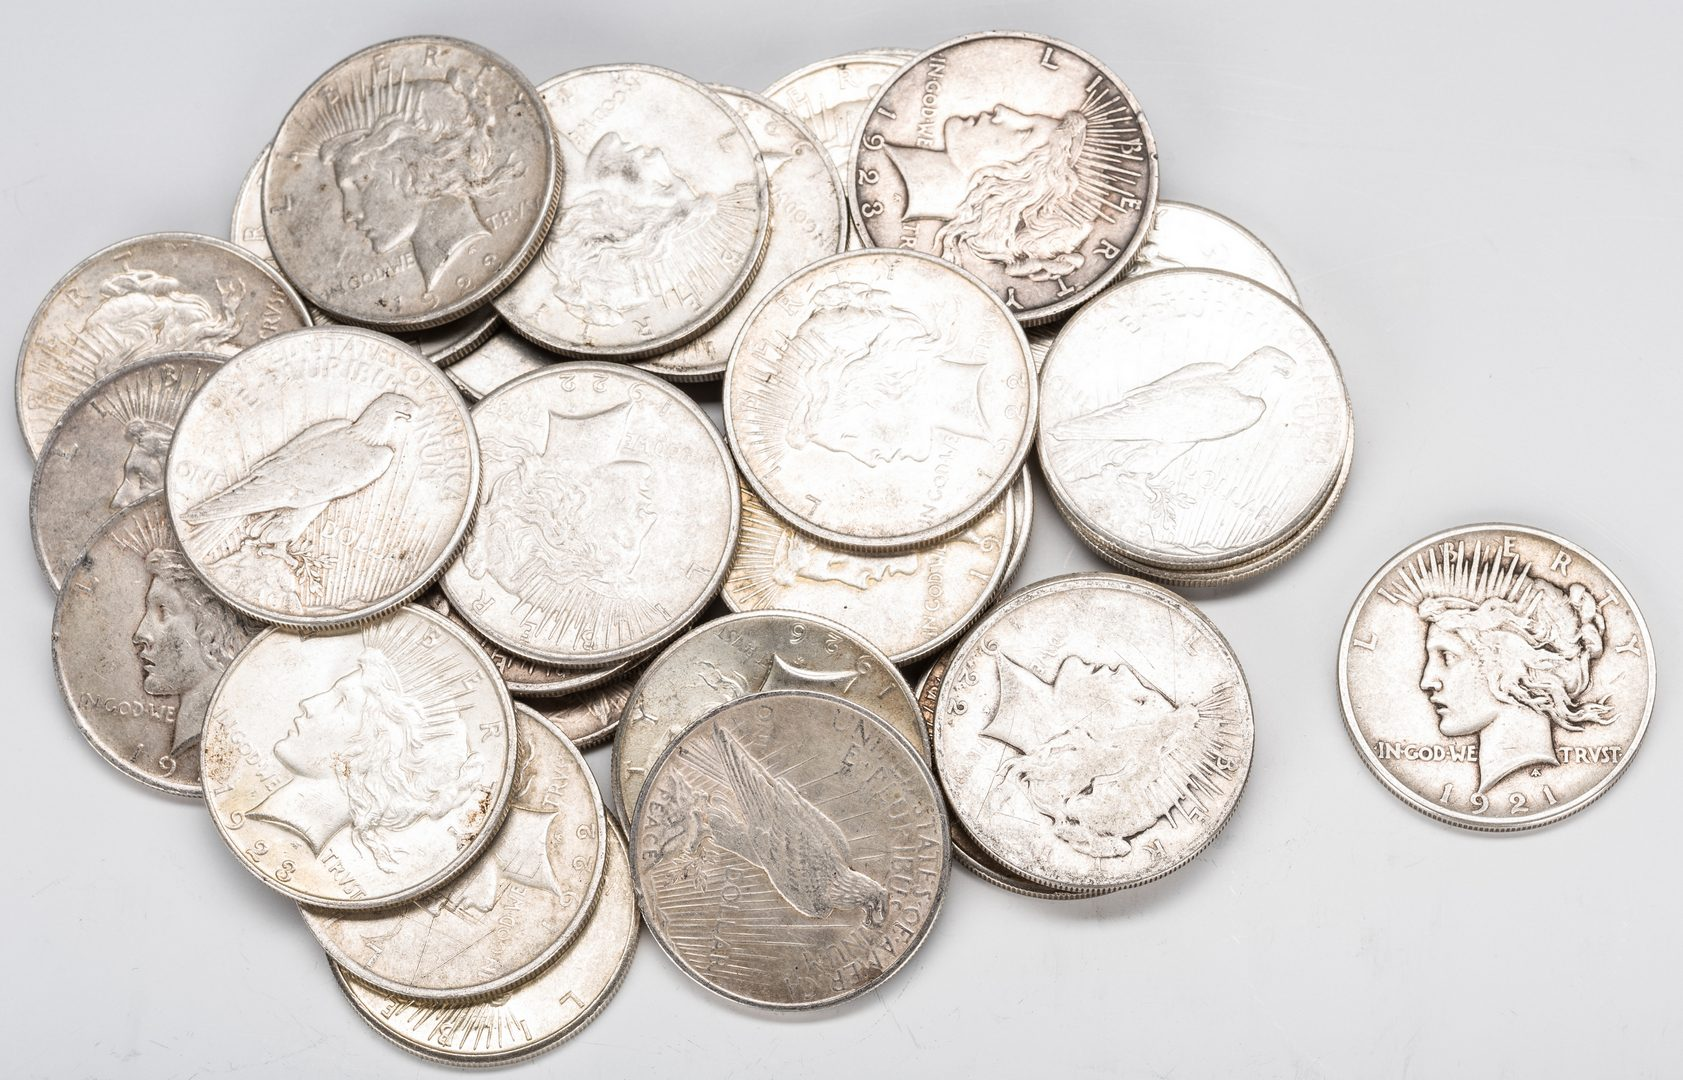 Lot 890: 32 U.S. Peace Silver Dollars, inc. 1921